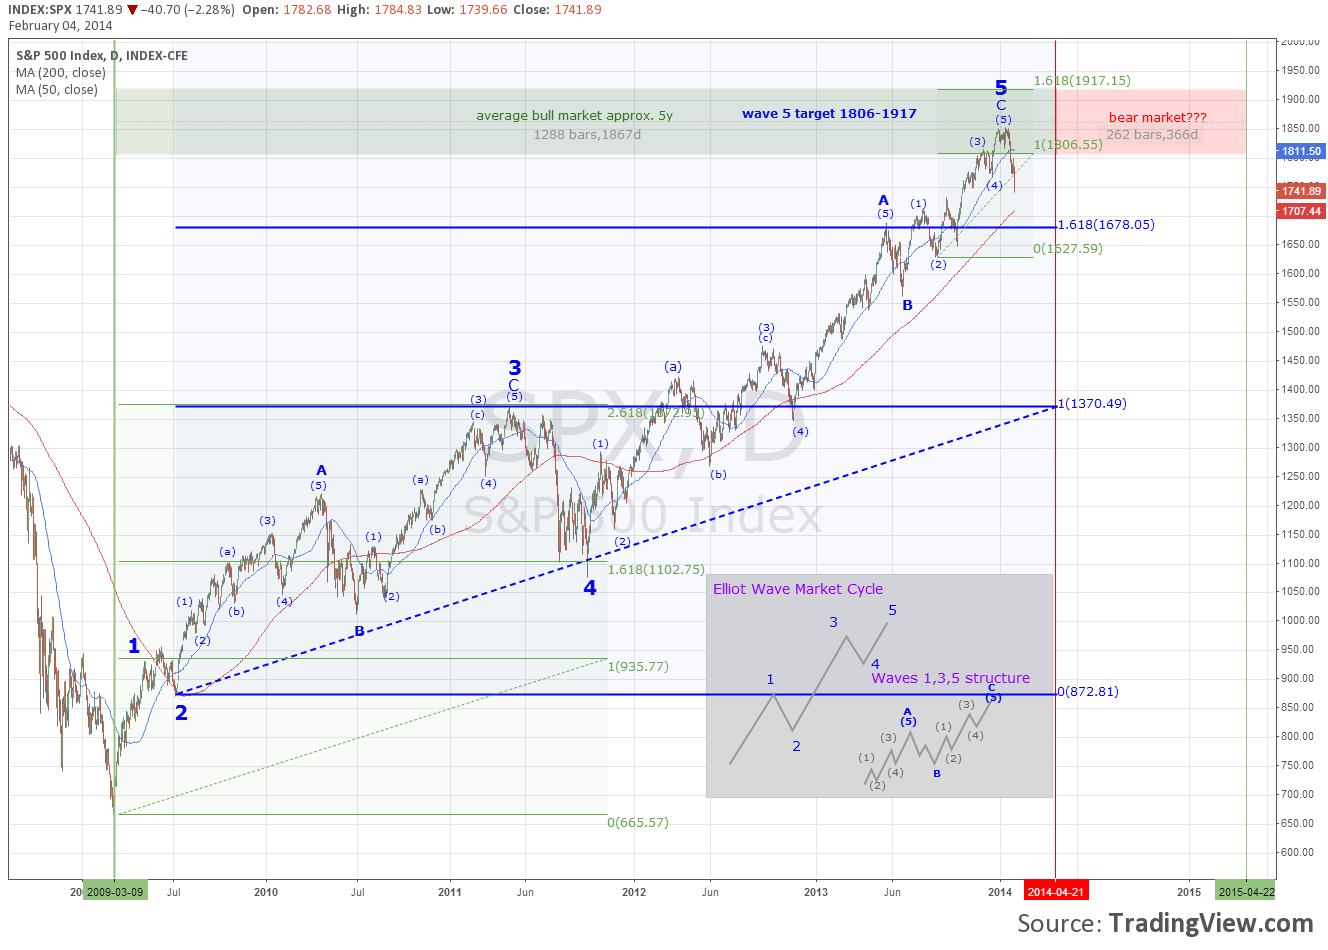 Bull market 2009-2014 peak